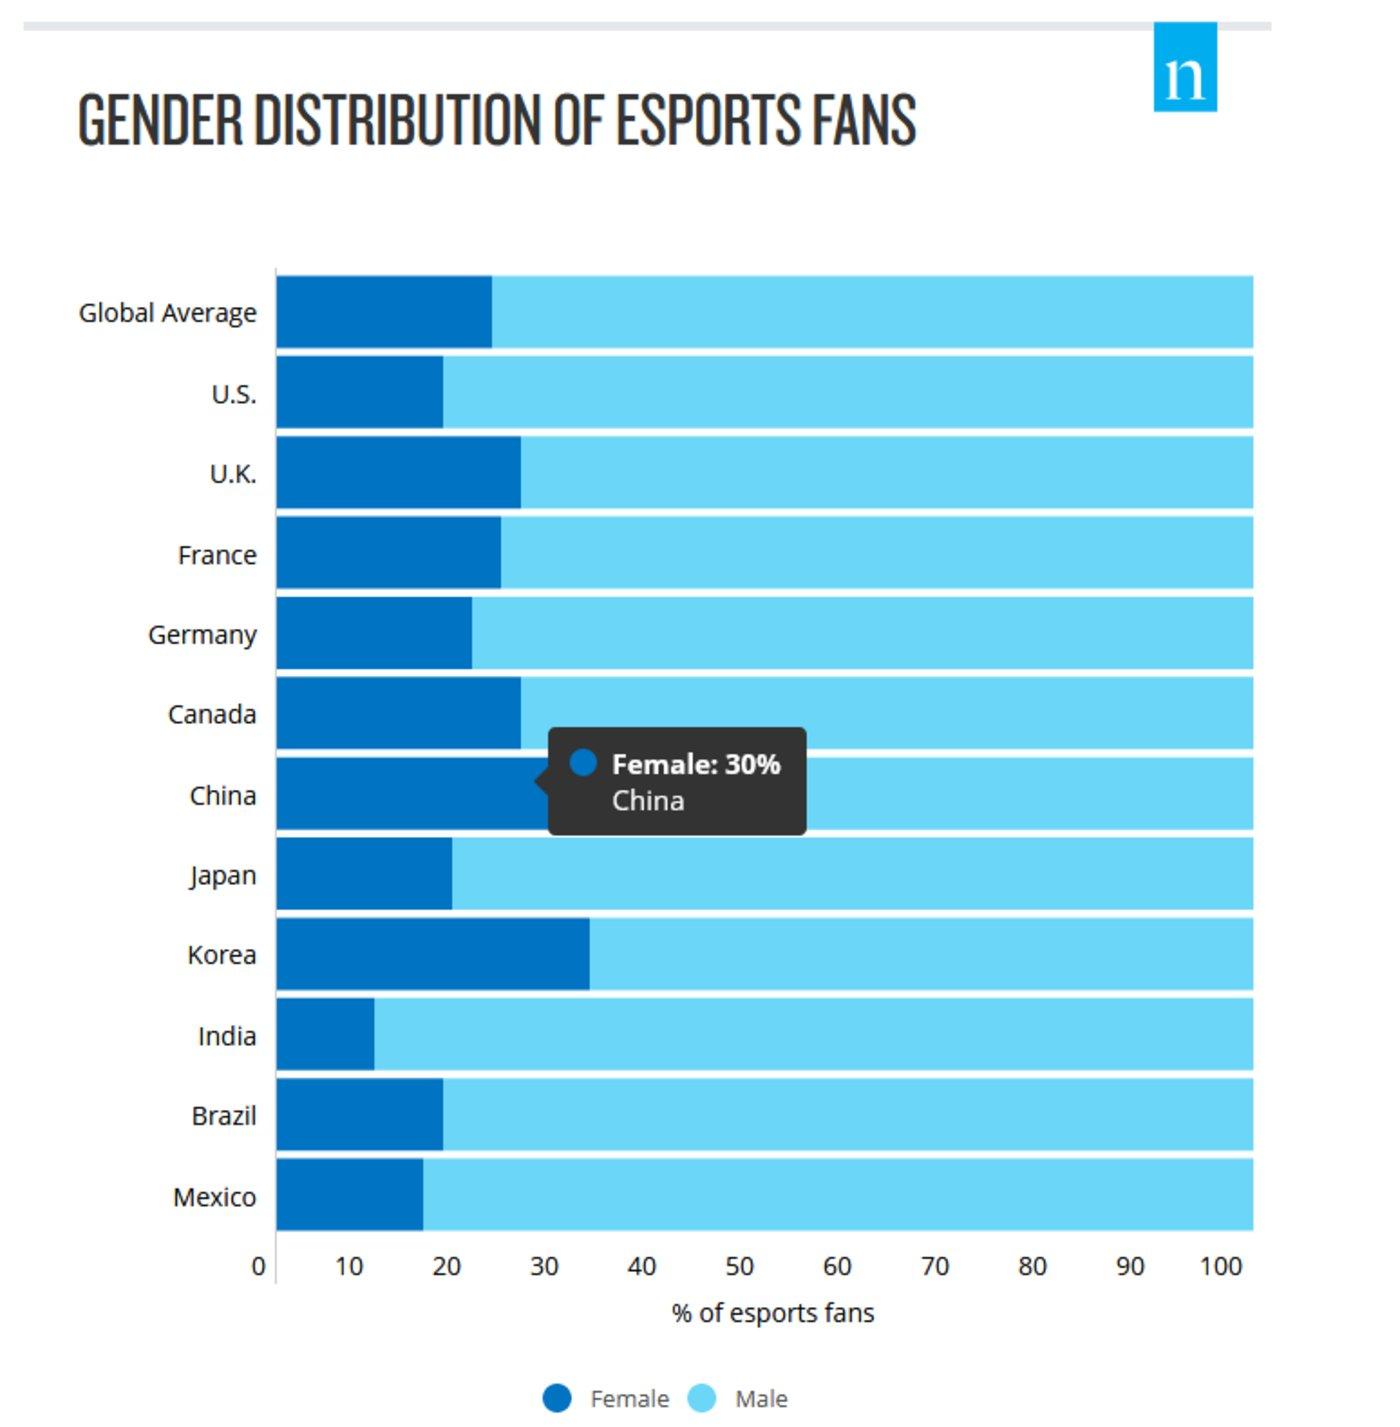 图:各国电竞迷分性别占比,来源:NielsenEsportsFanInsights